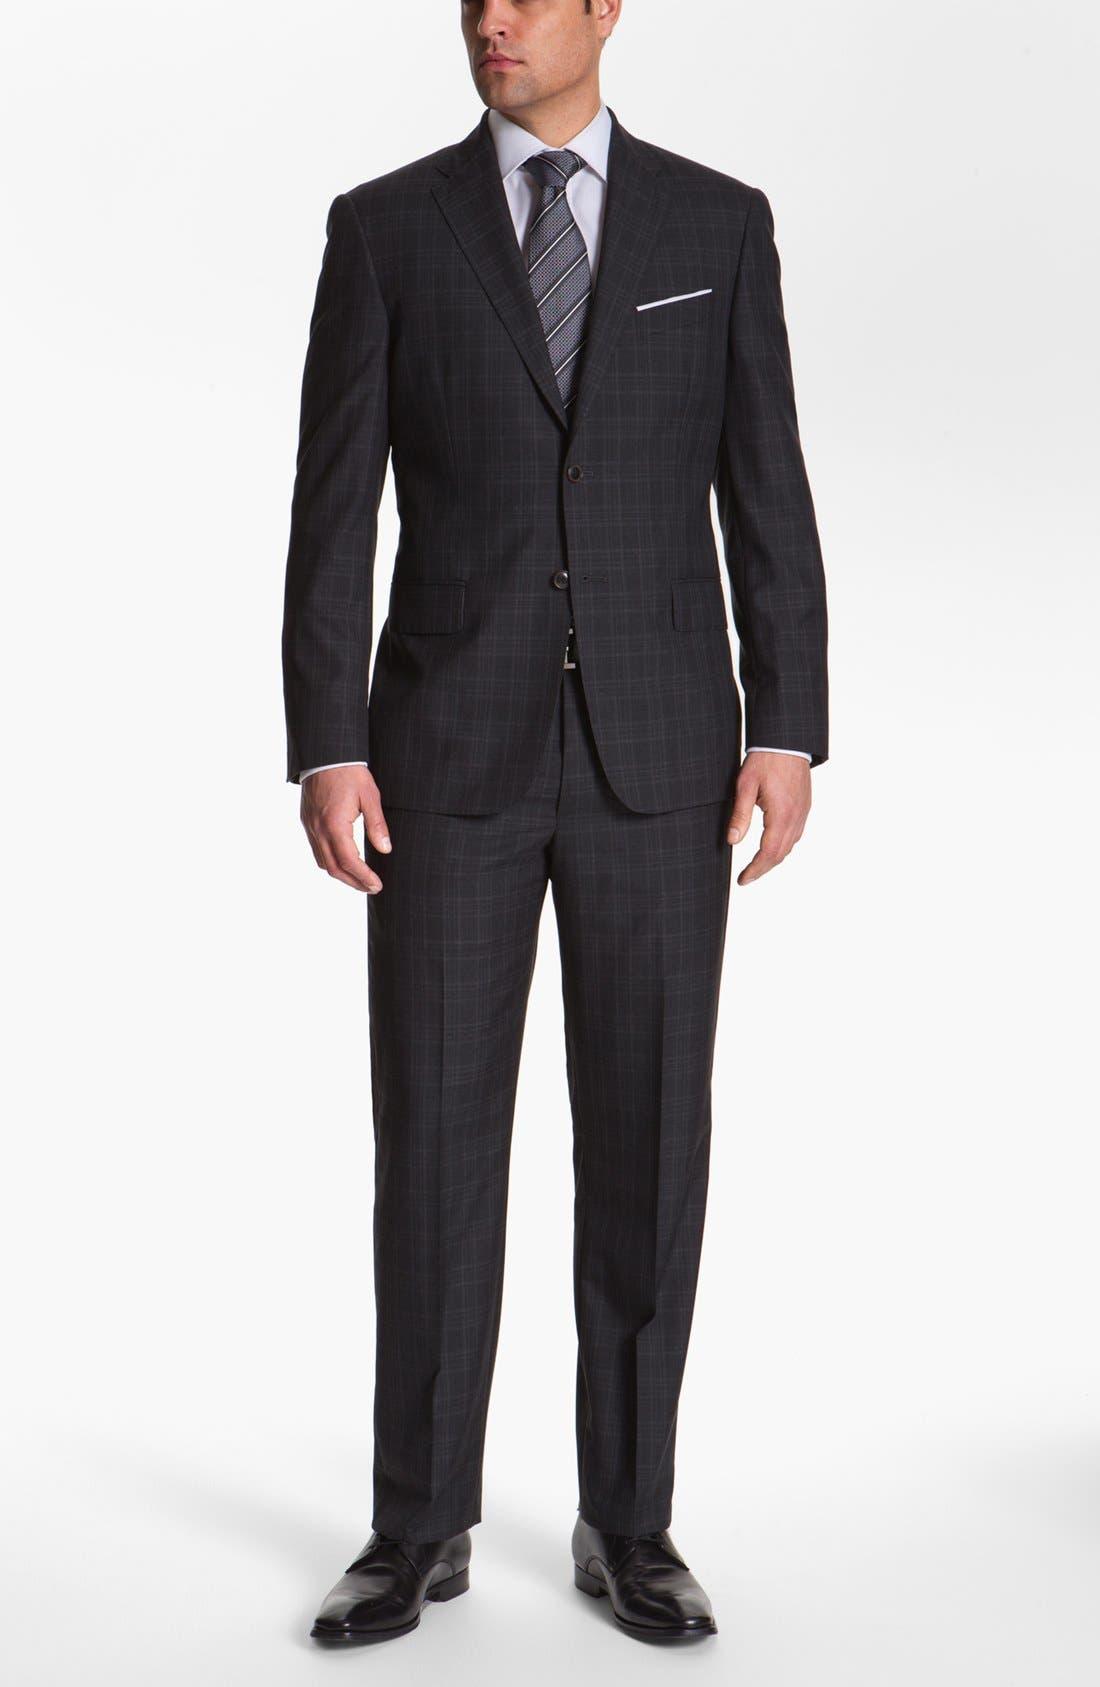 Main Image - Joseph Abboud 'Platinum' Plaid Wool Suit